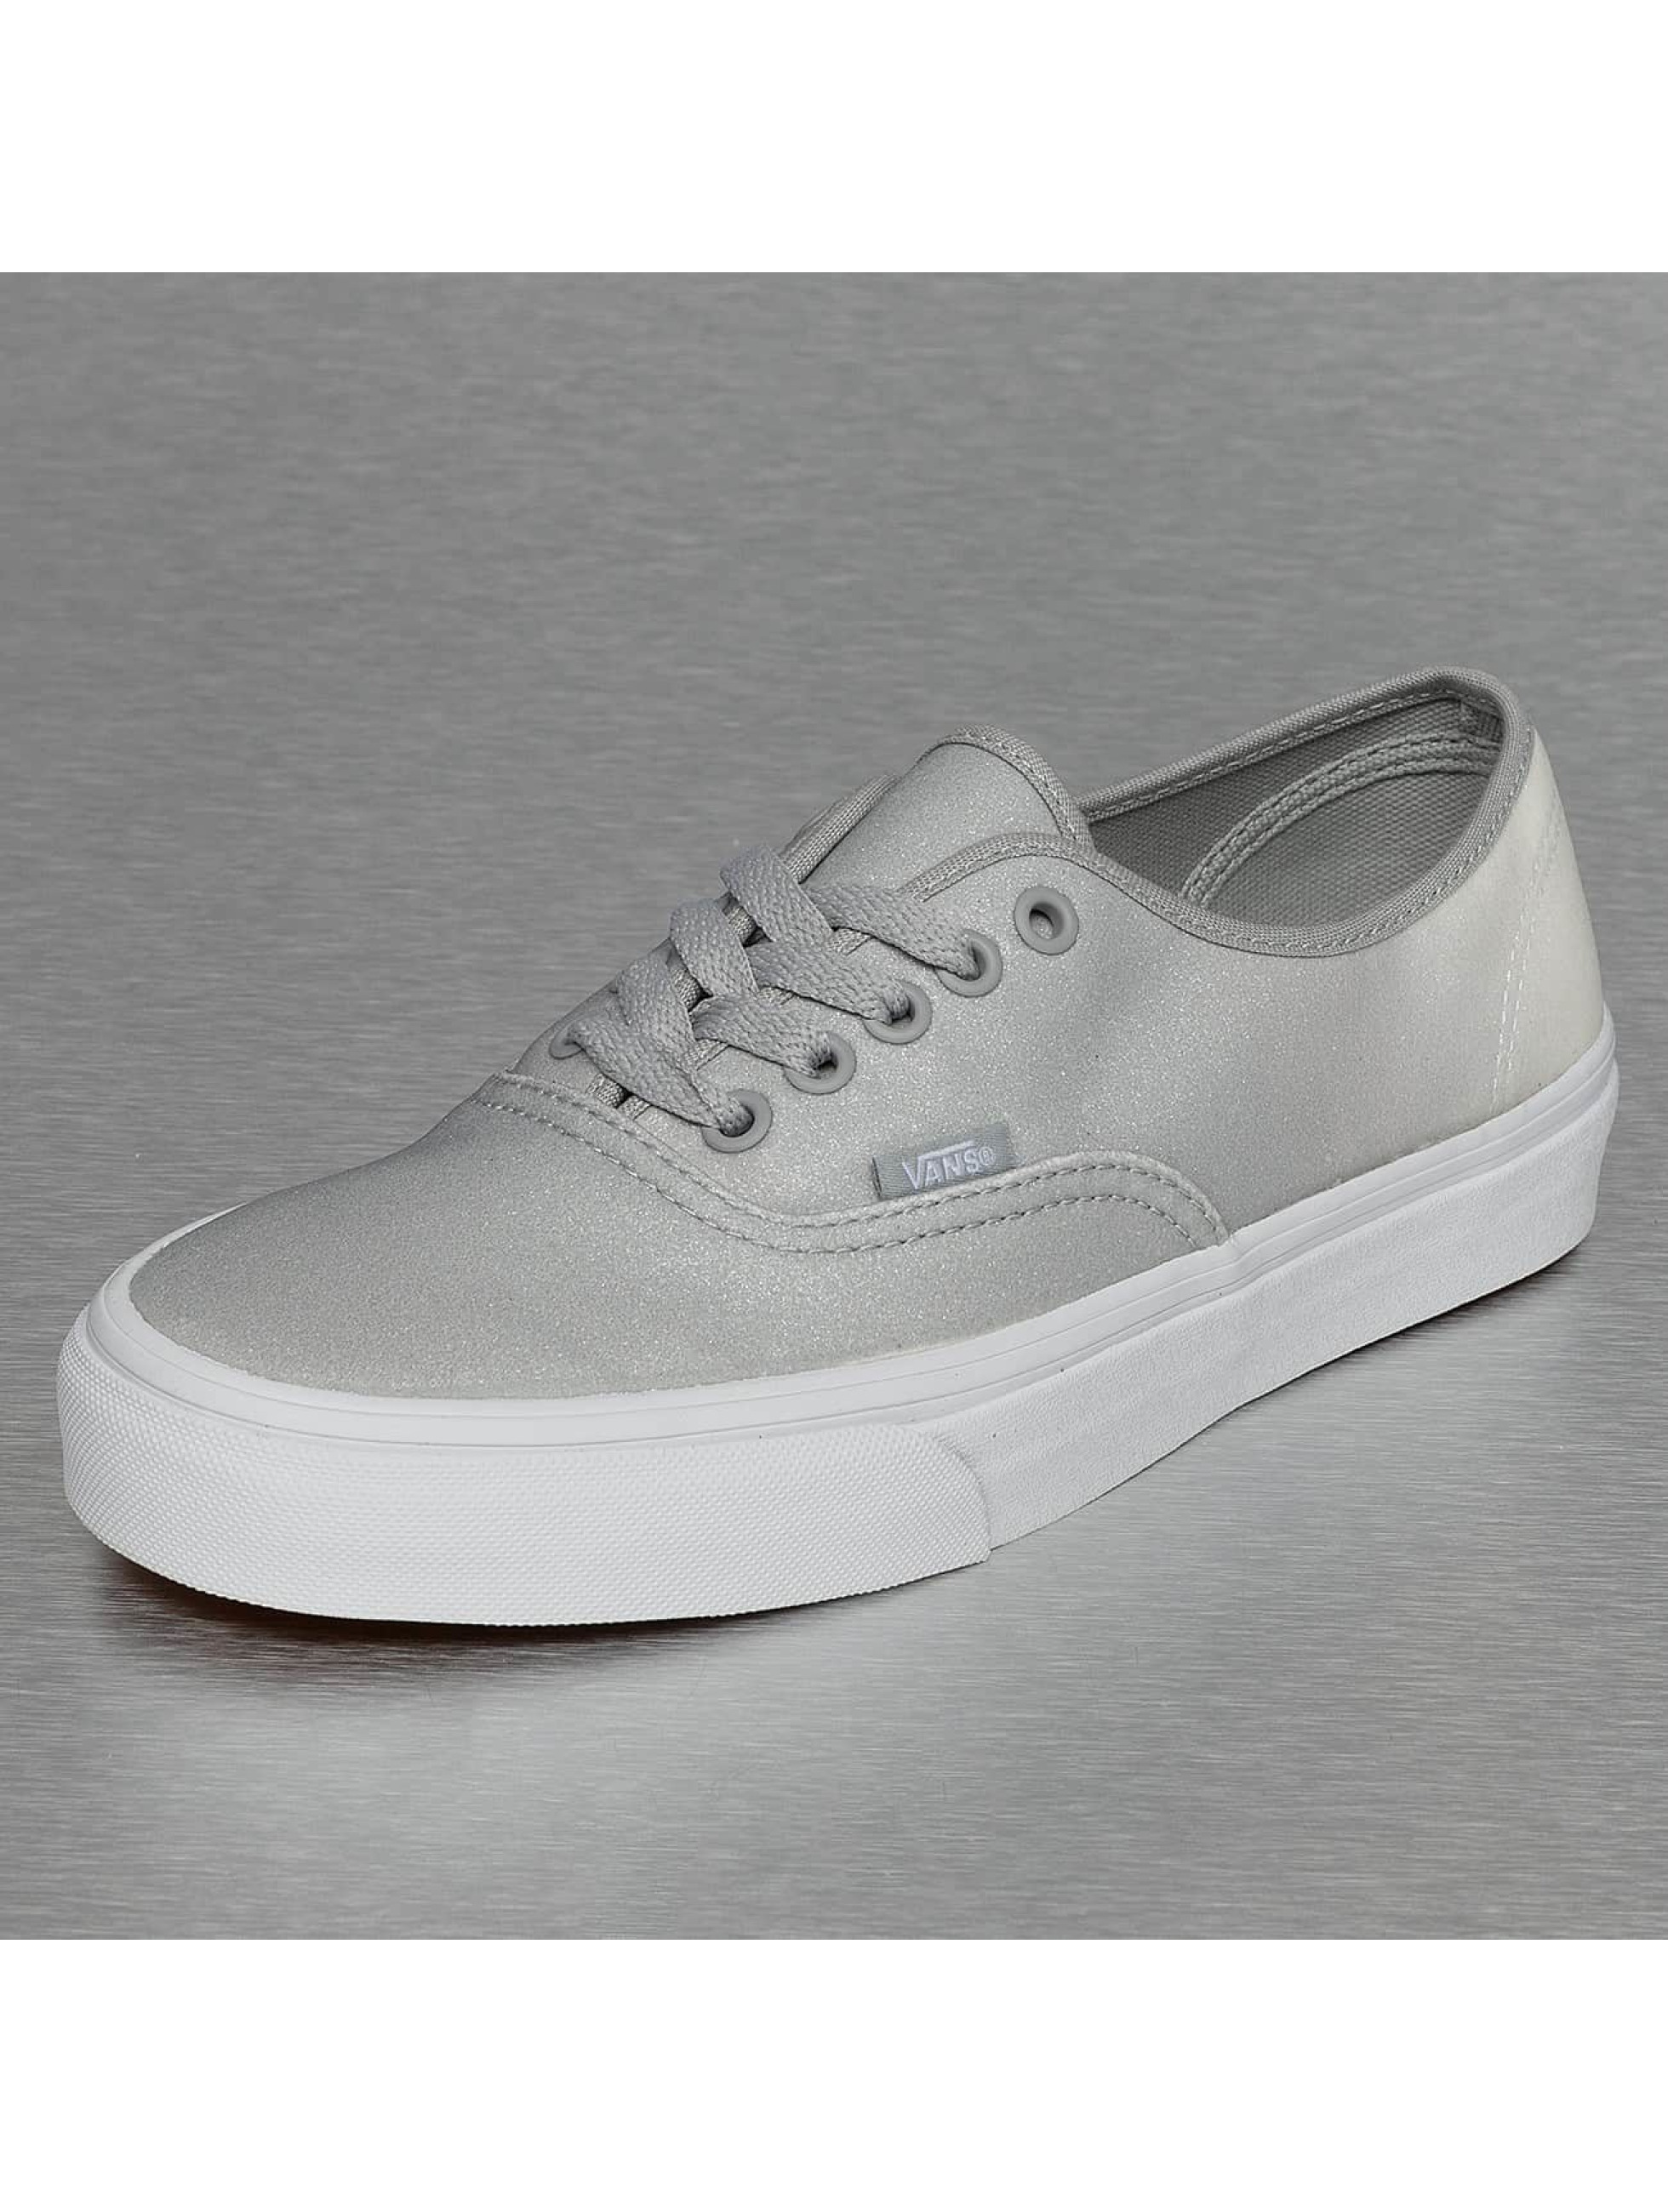 Vans Сникеры Authentic 2 Tone Glitter белый